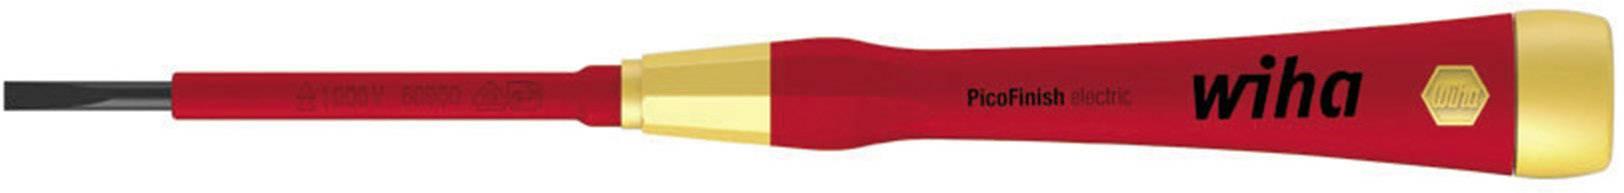 Plochý skrutkovač VDE Wiha PicoFinish 2270P 38876, čepeľ 60 mm